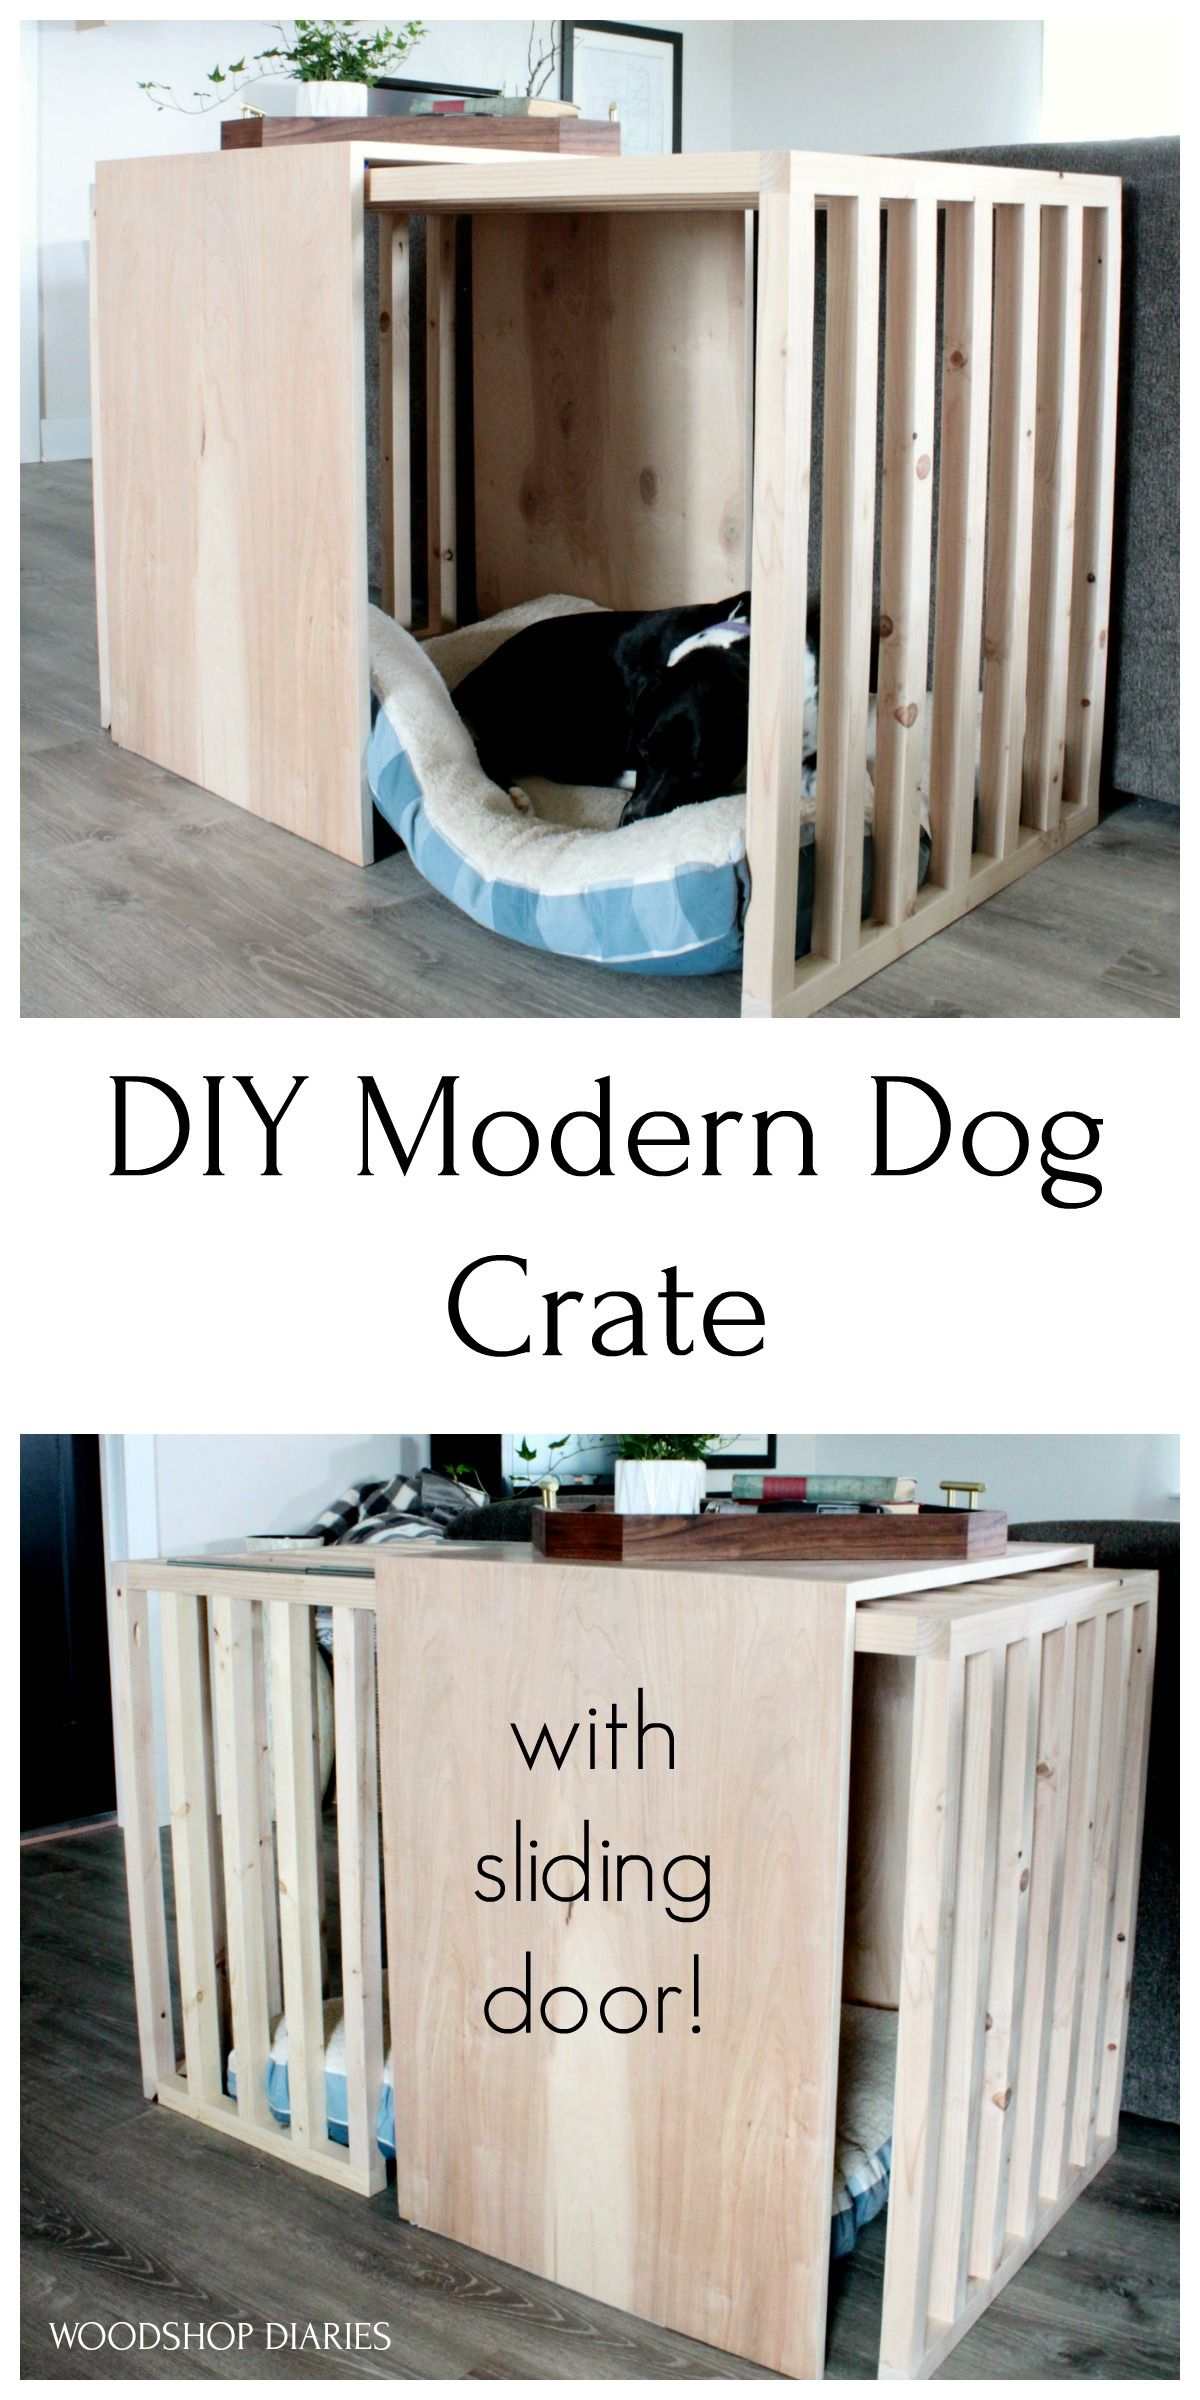 DIY Modern Dog Crate With Sliding Door